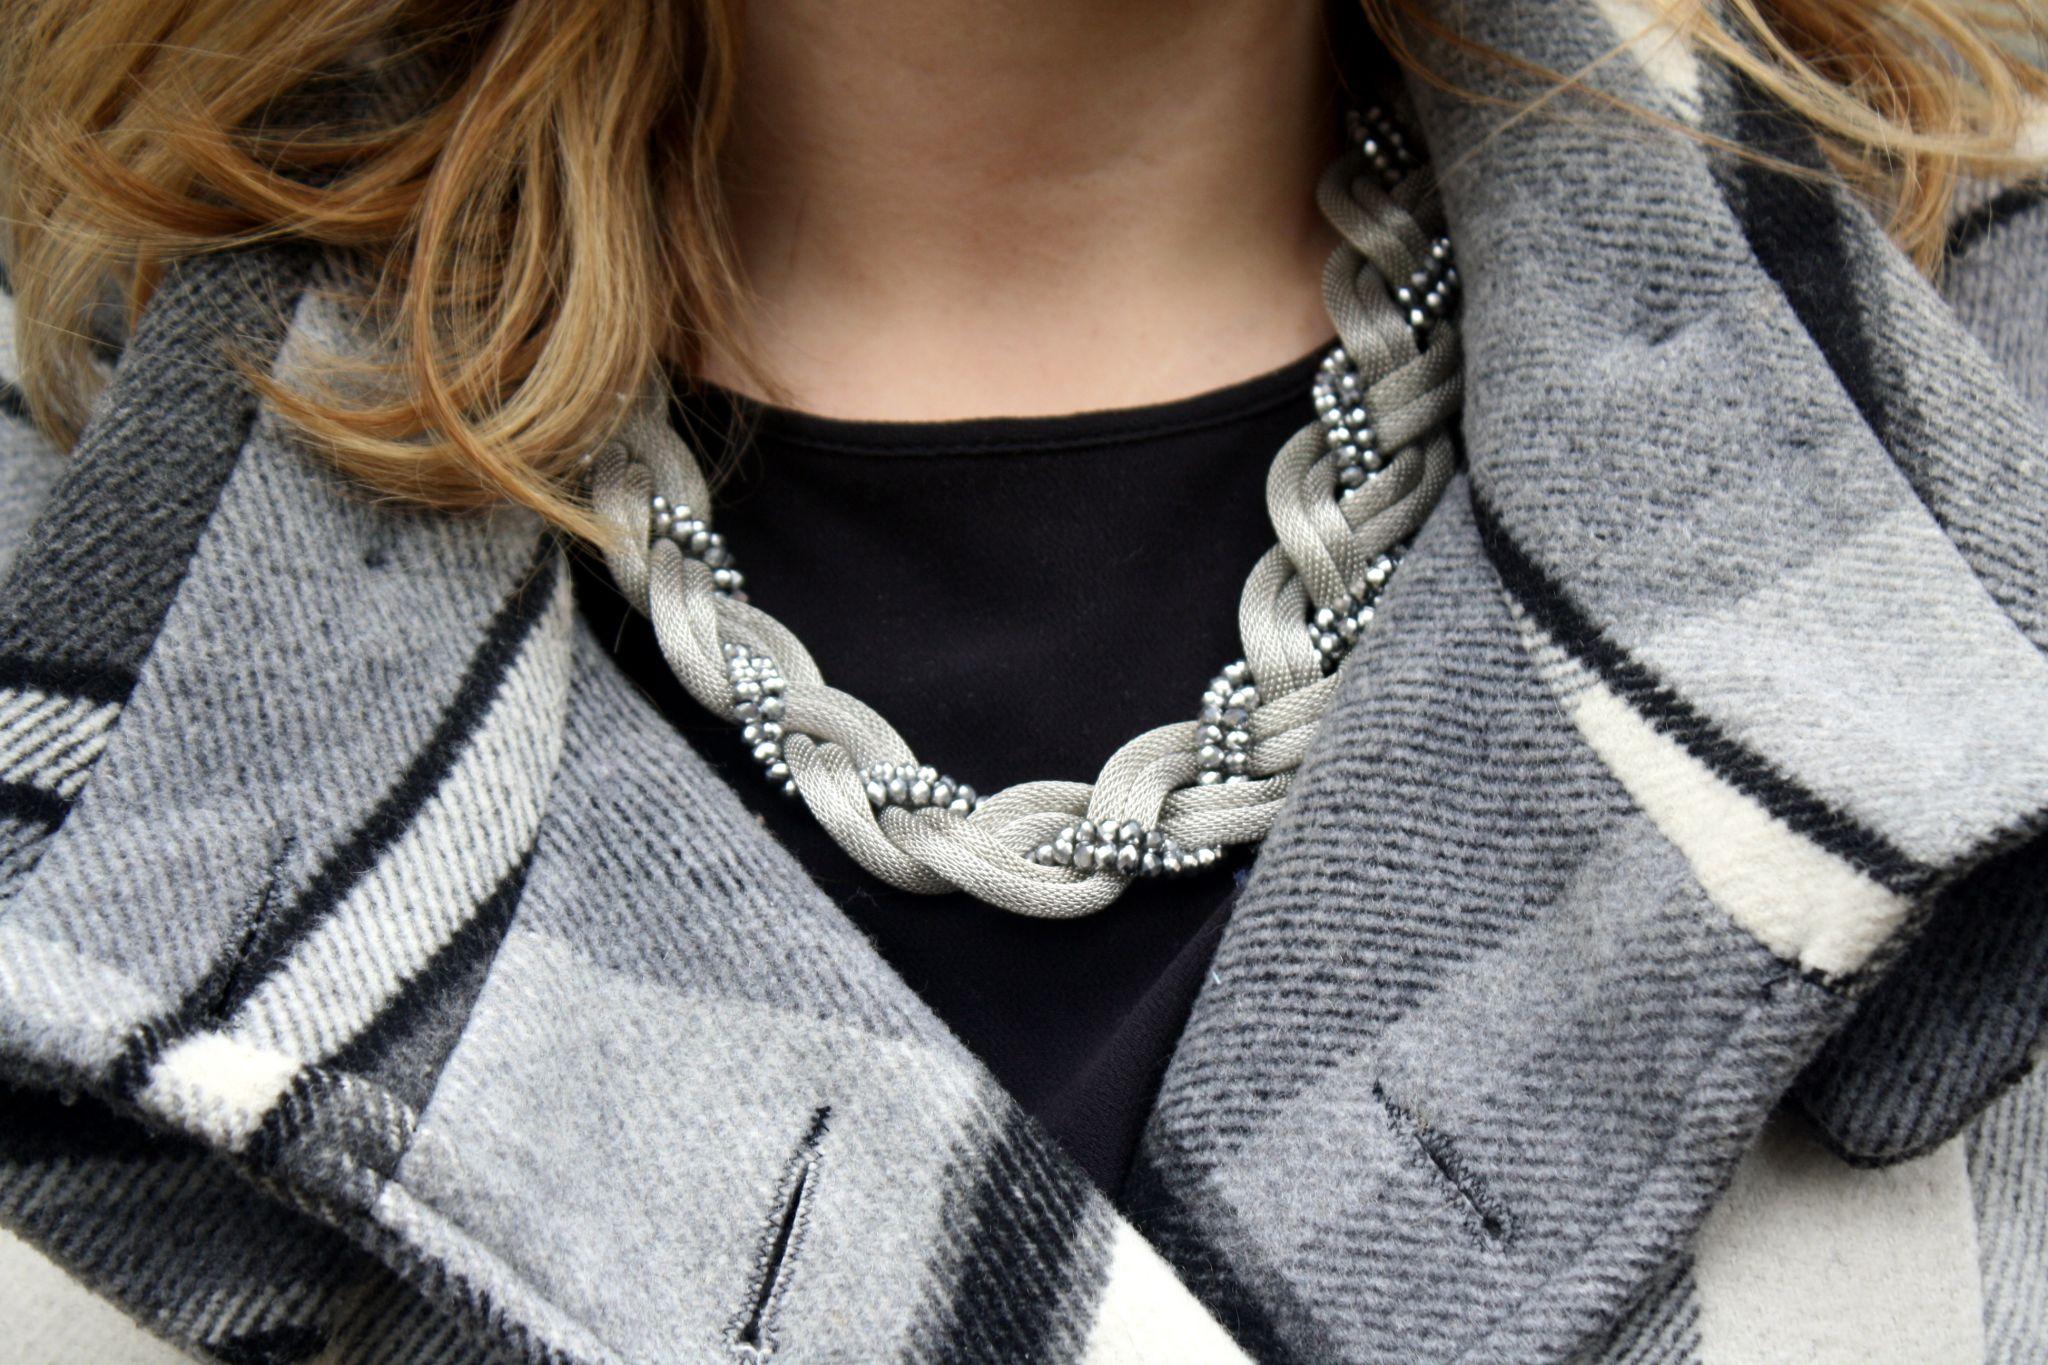 Necklace, Violet Glenton, Yours Clothing